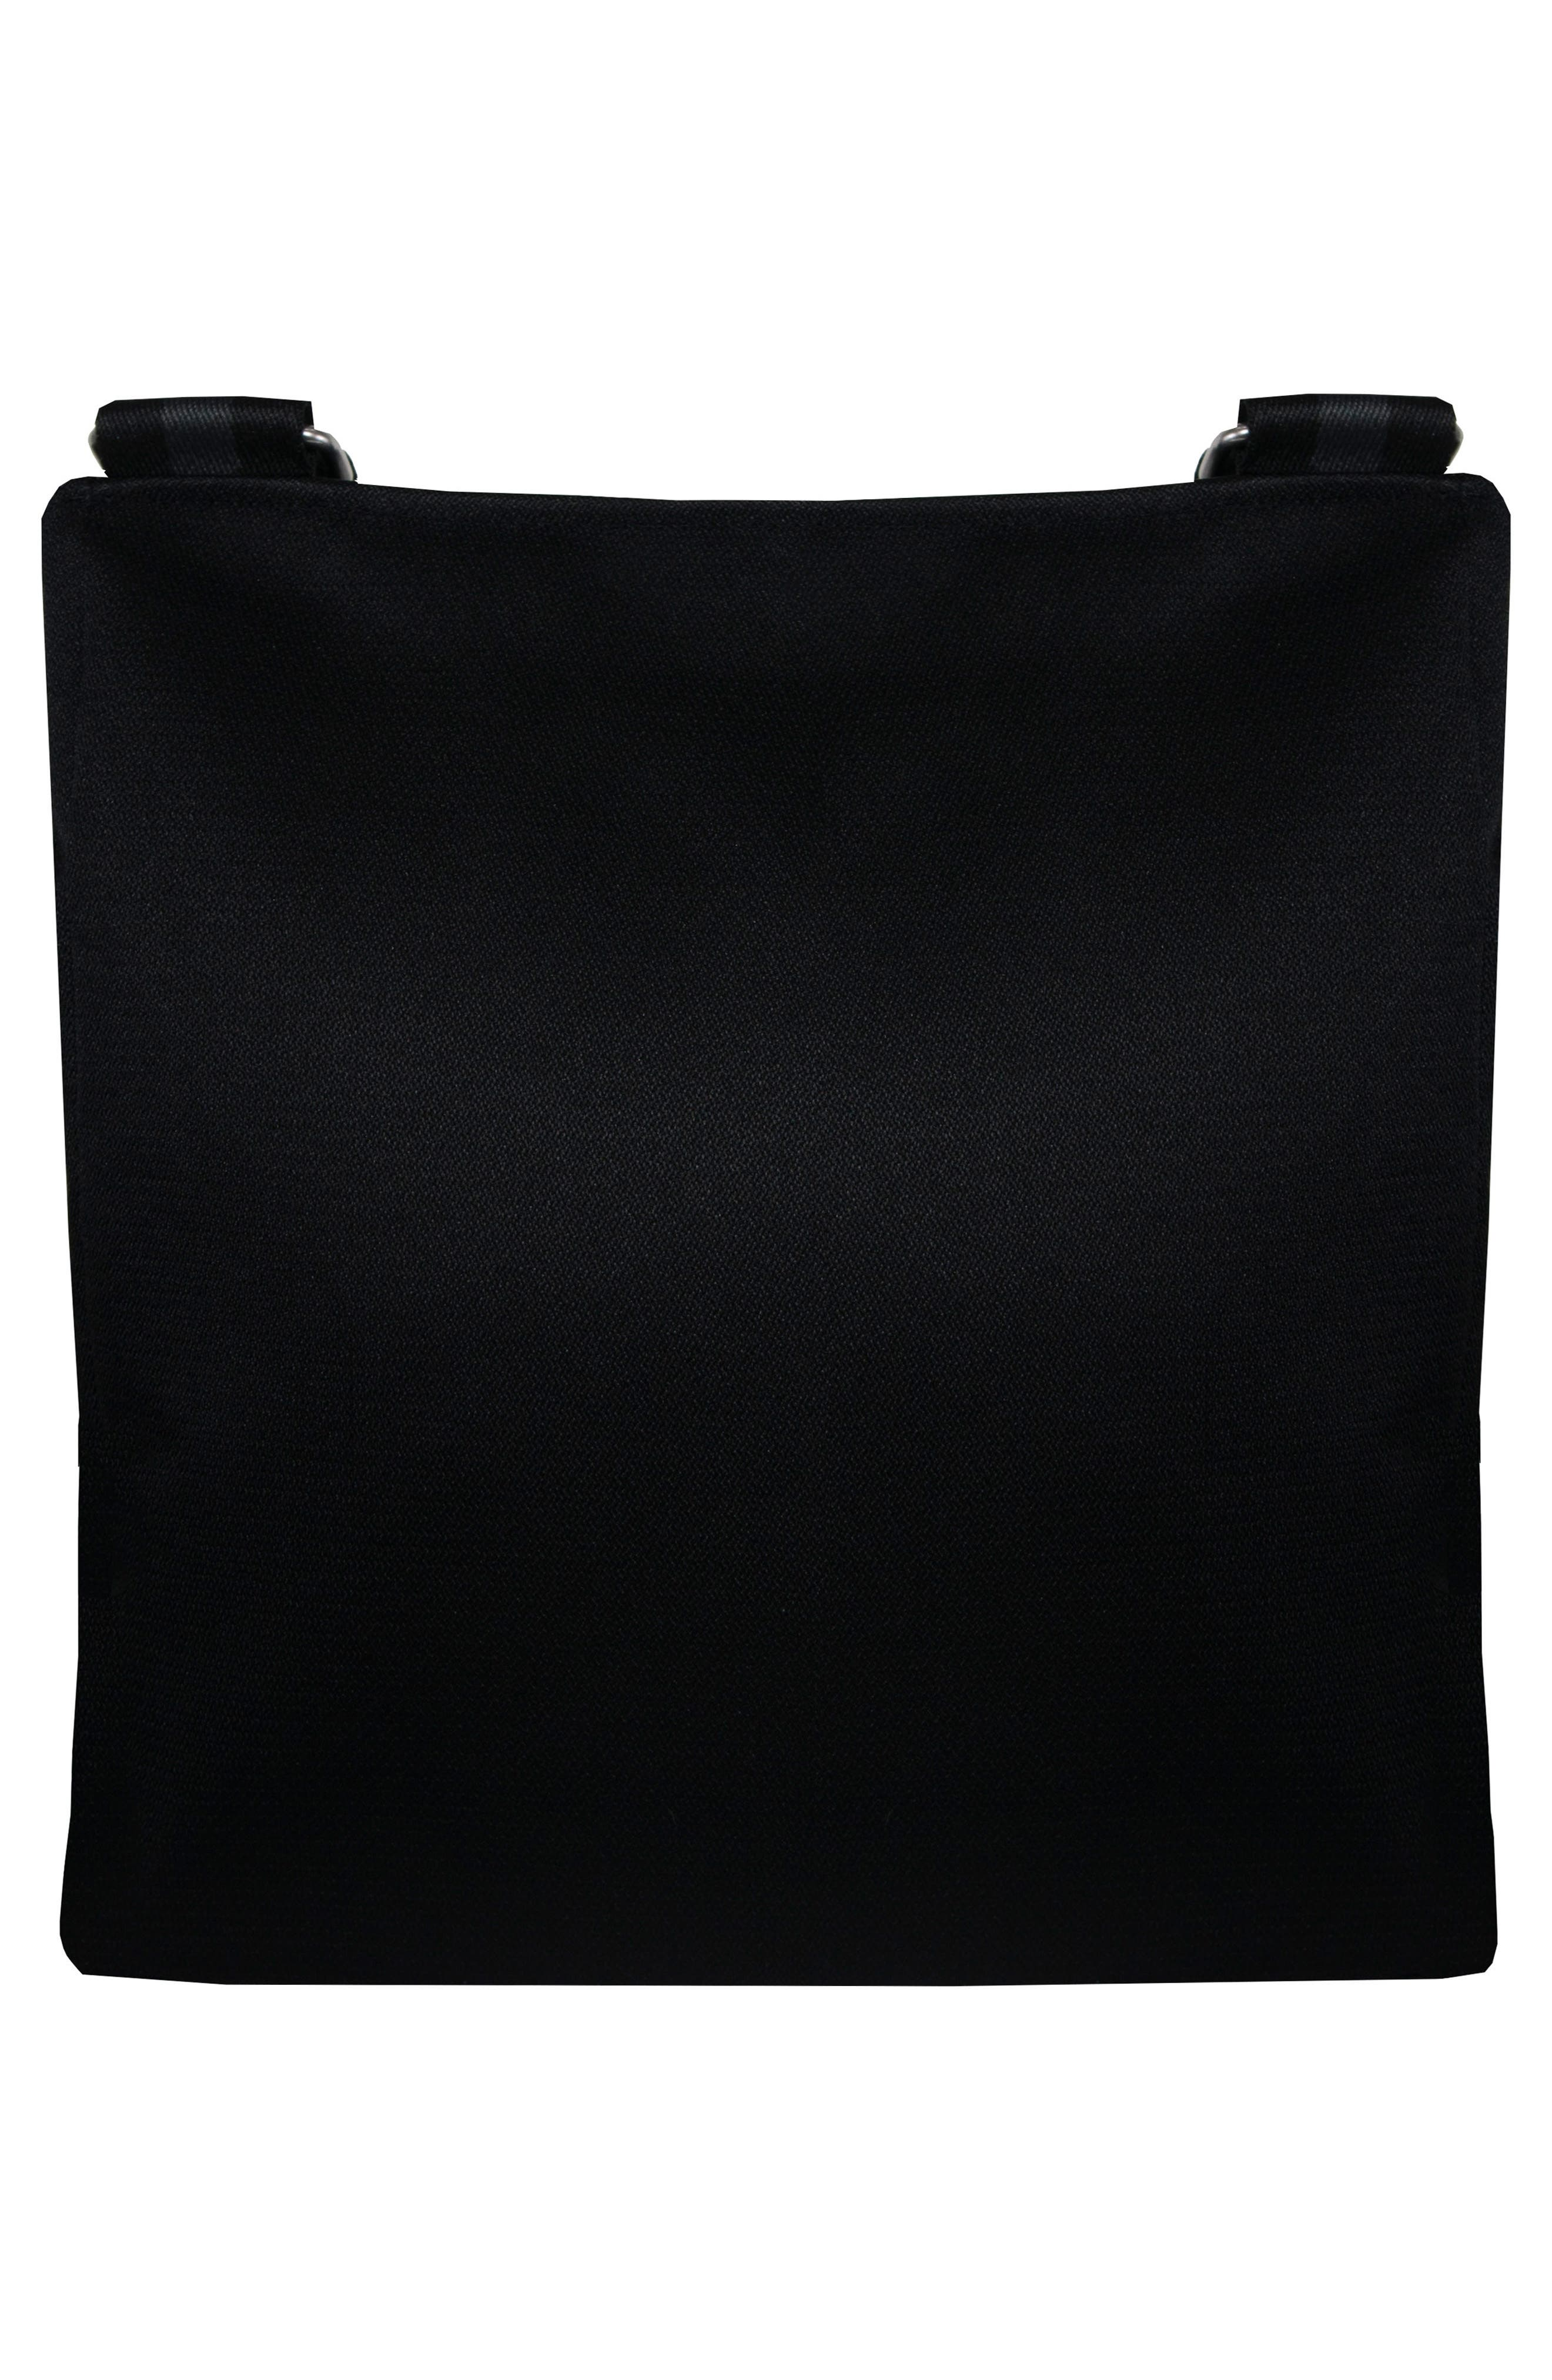 Jag FRFID Crossbody Bag,                             Alternate thumbnail 3, color,                             Birch